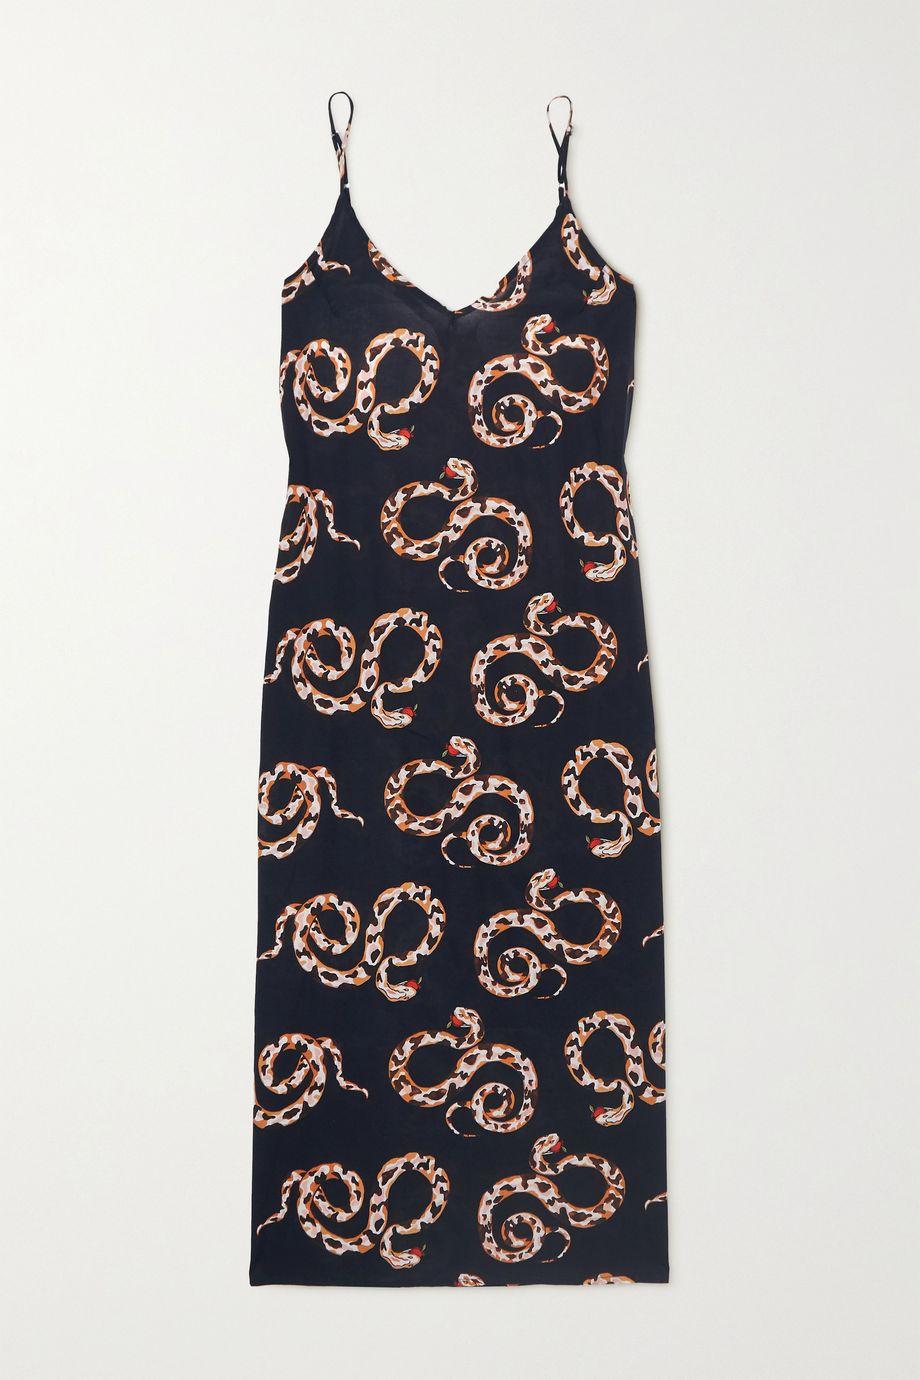 Desmond & Dempsey Printed organic cotton-voile nightdress